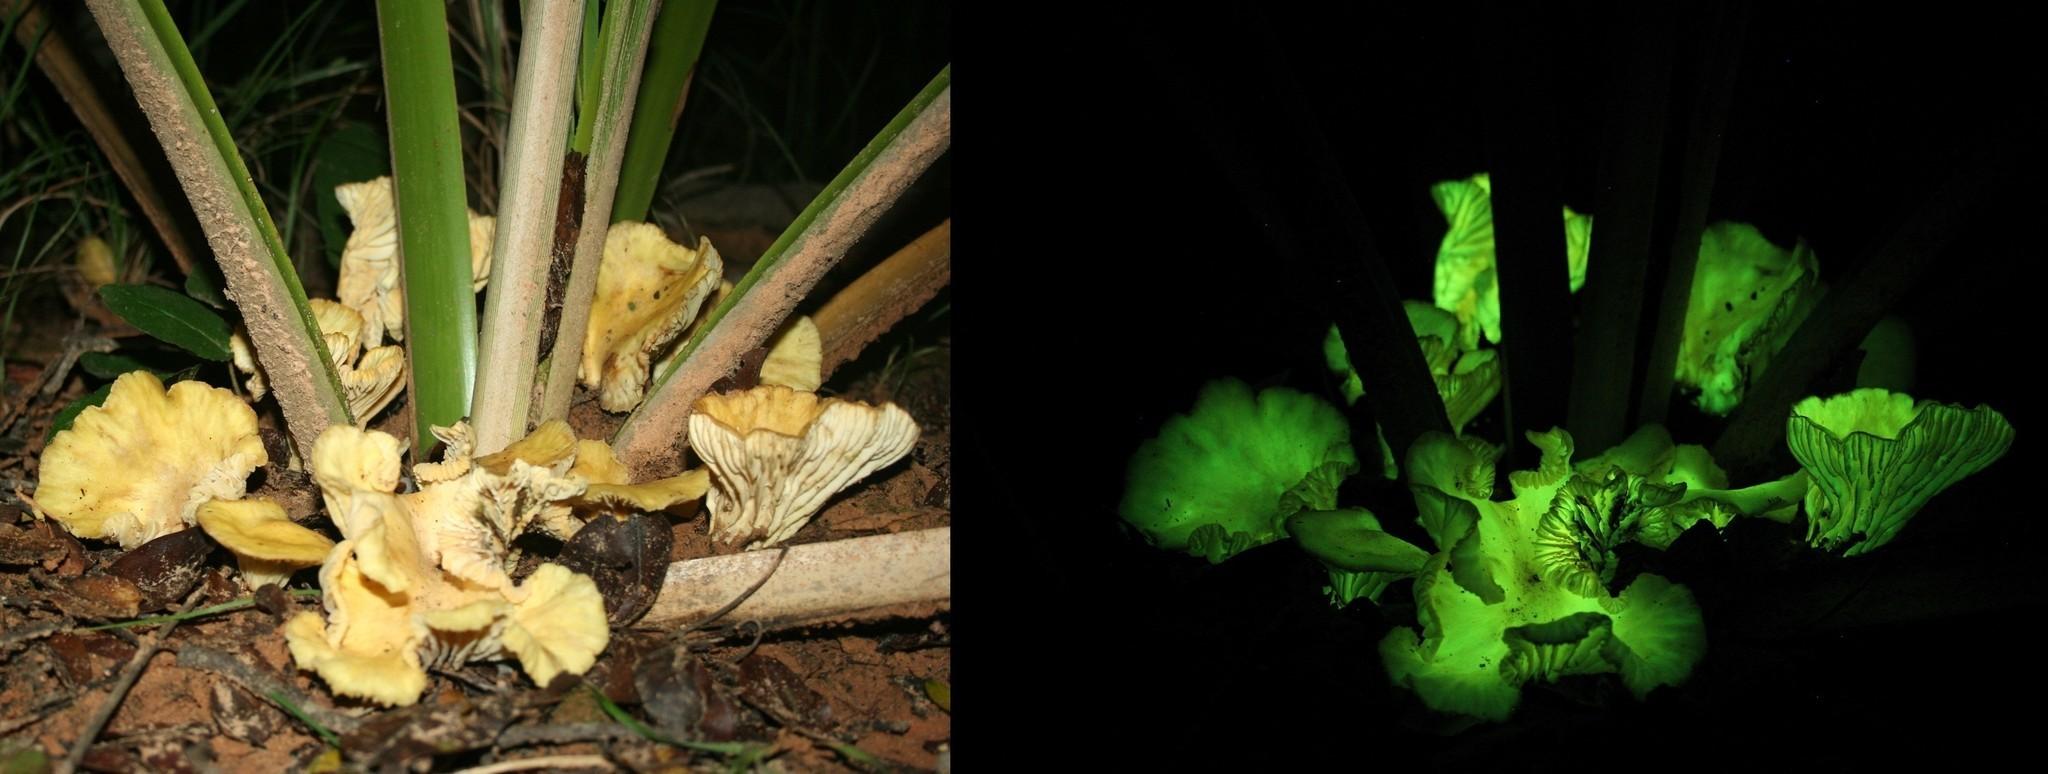 Mushroom glows in the dark like a fungal firefly